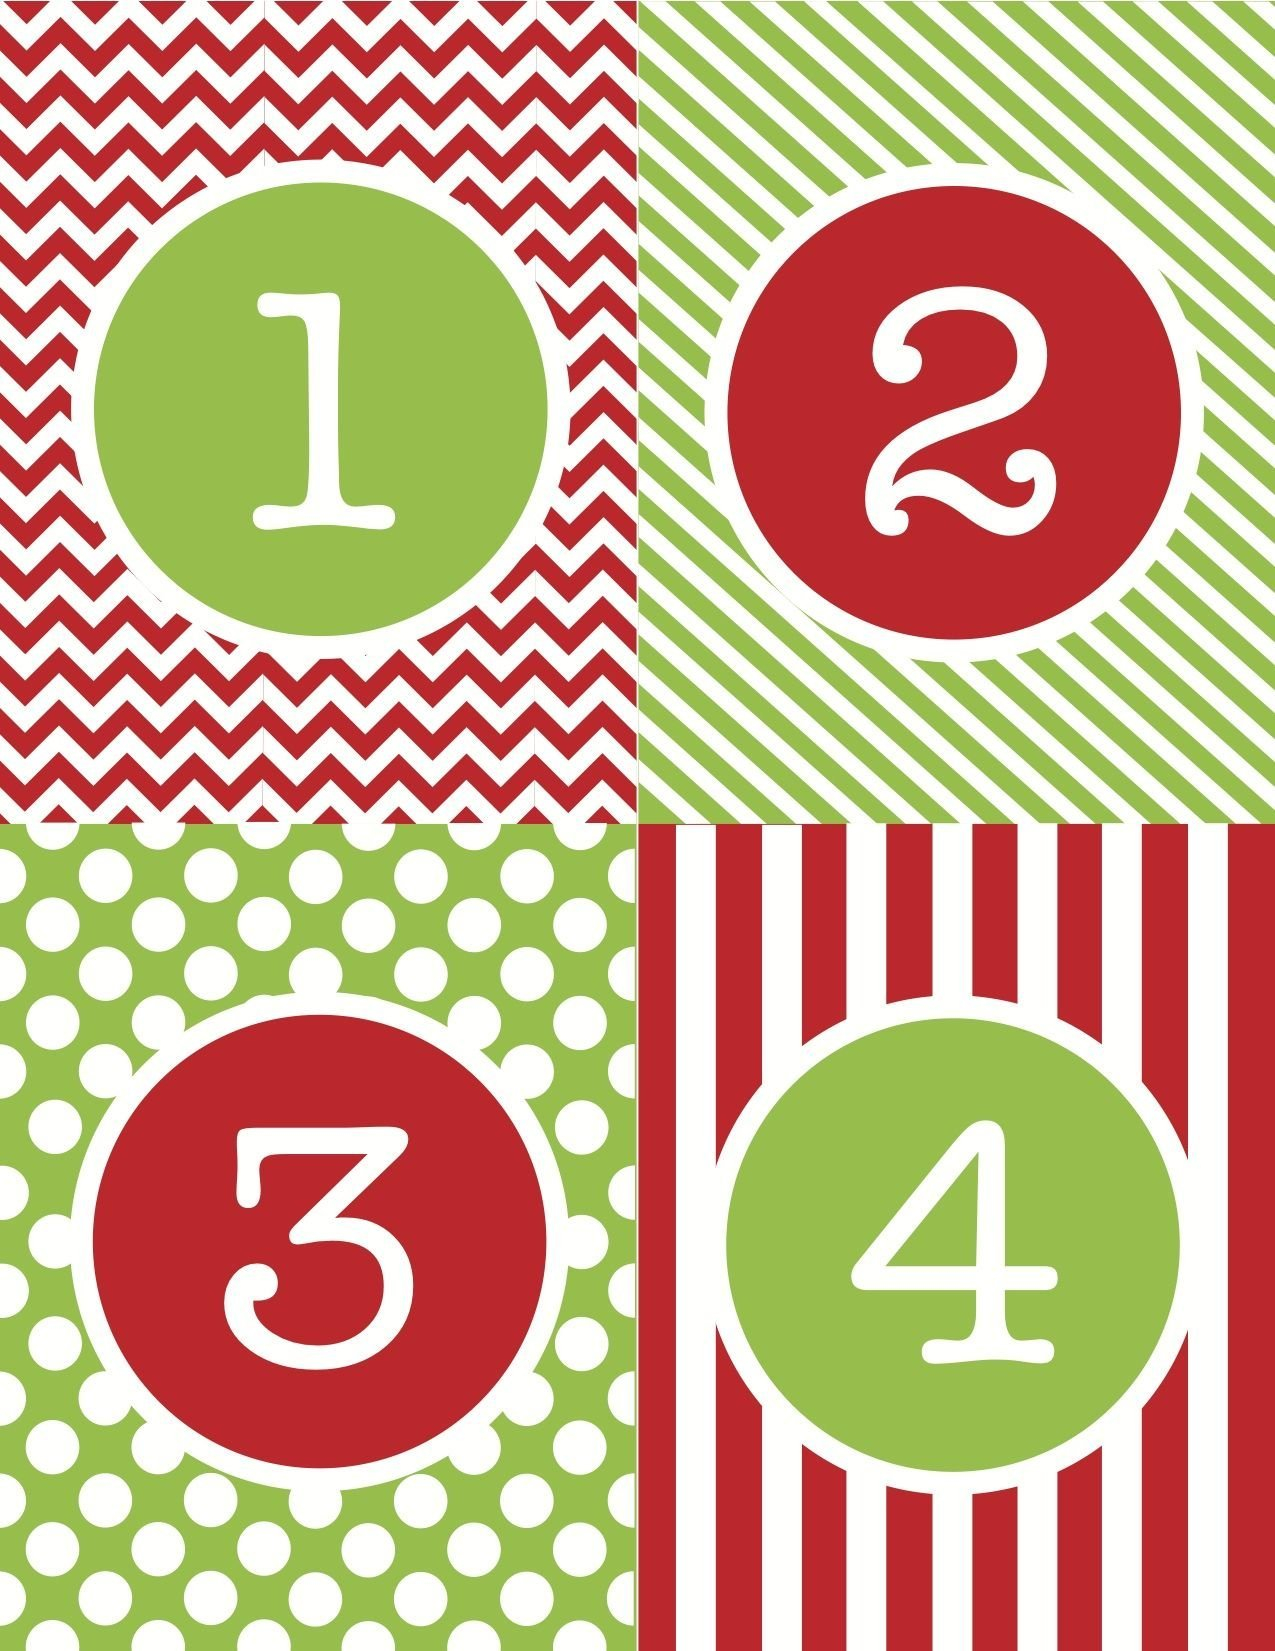 Calendar Numbers 1-31 For Spring :-Free Calendar Template Printable Calendar Numbers 1-31 May